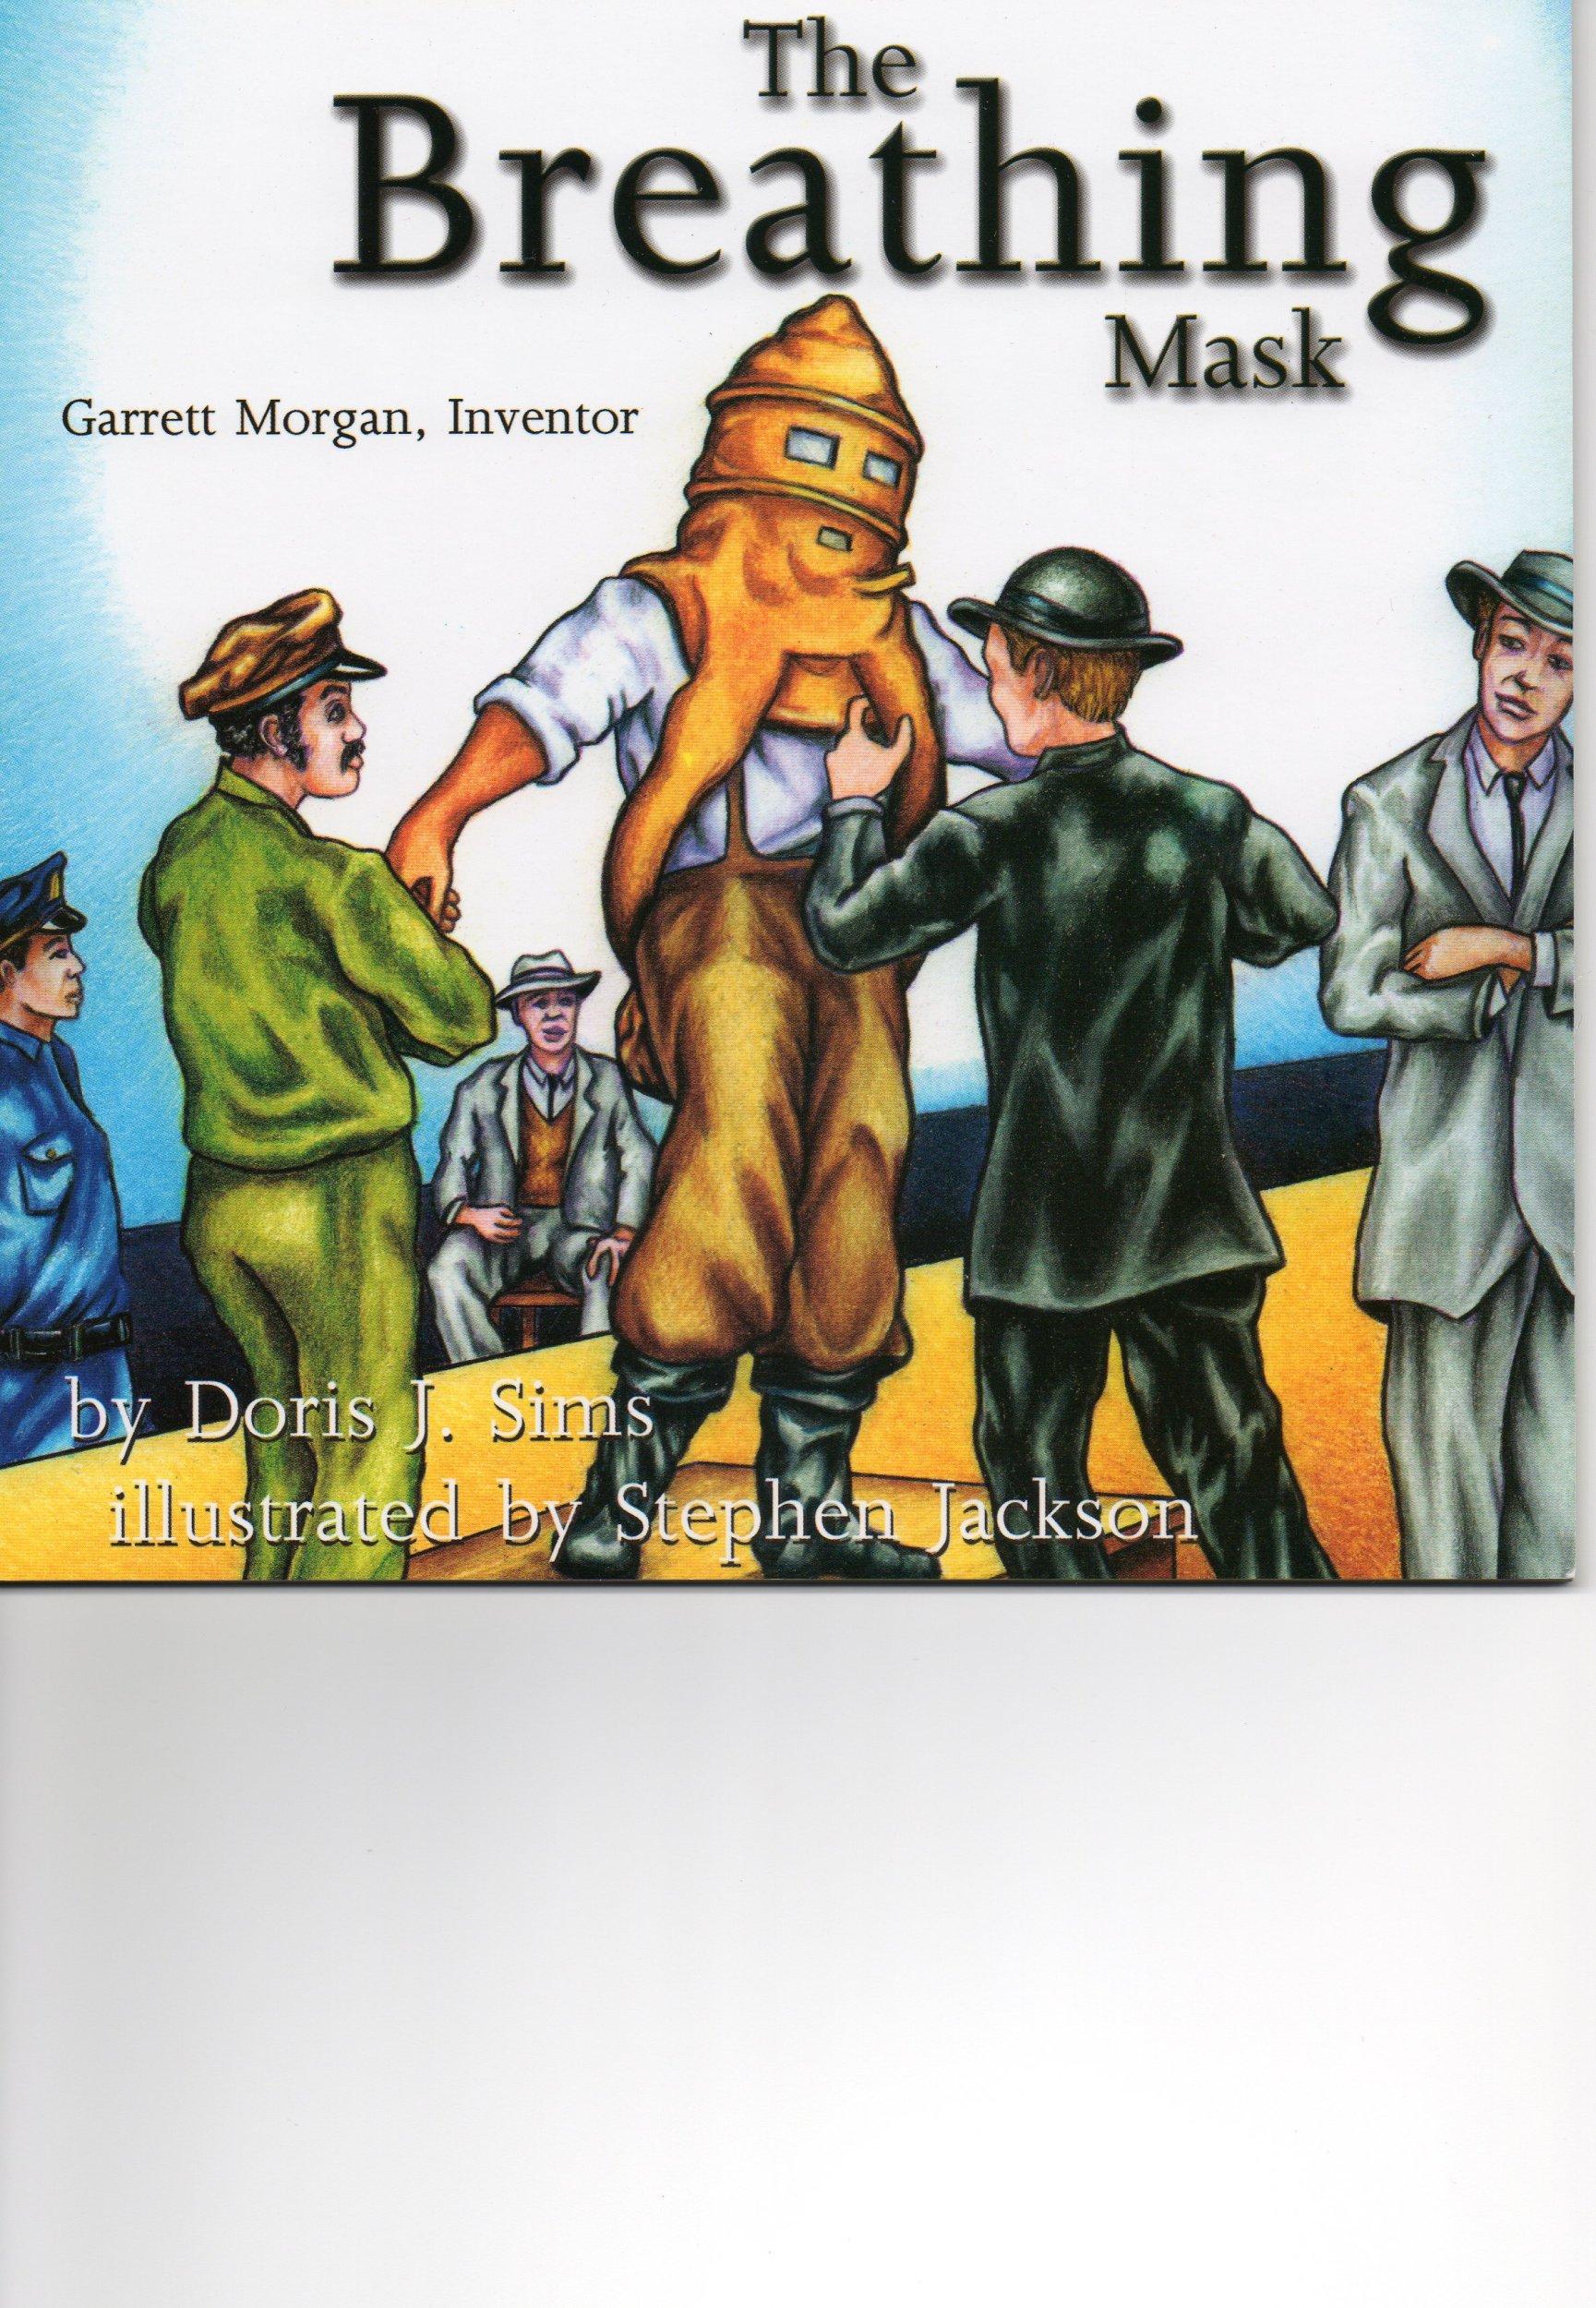 Download The Breathing Mask Garrett Morgan Inventor ebook